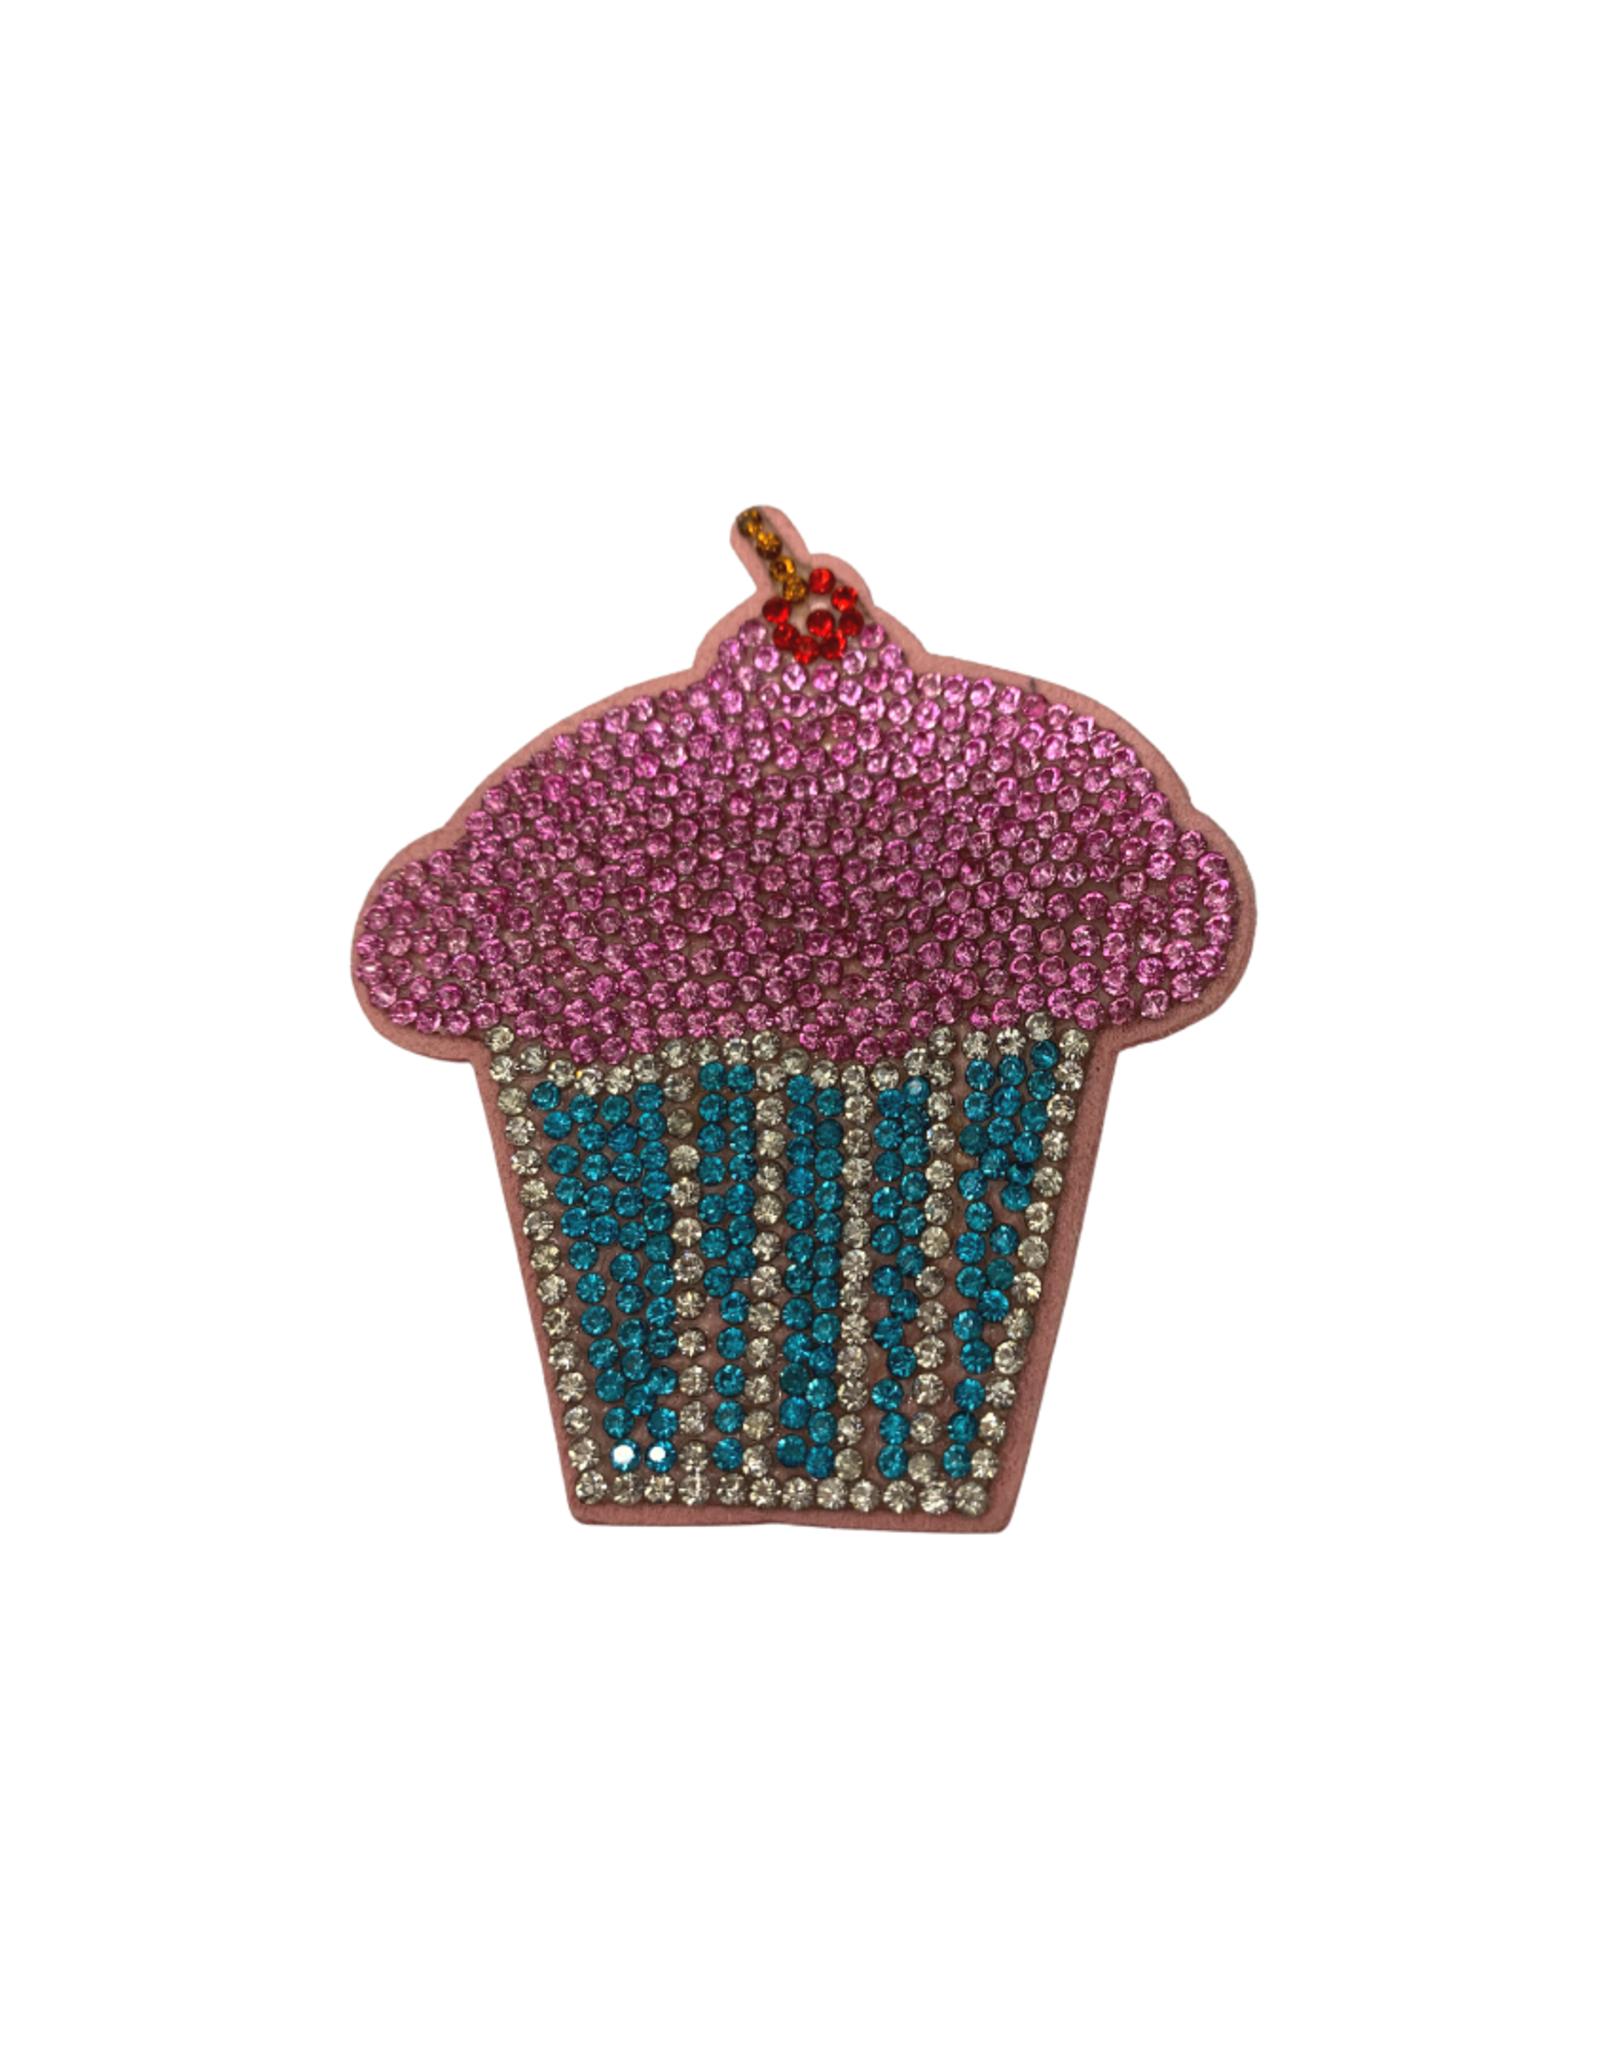 Bows Arts Rhinestone Motif Clip - Cupcake